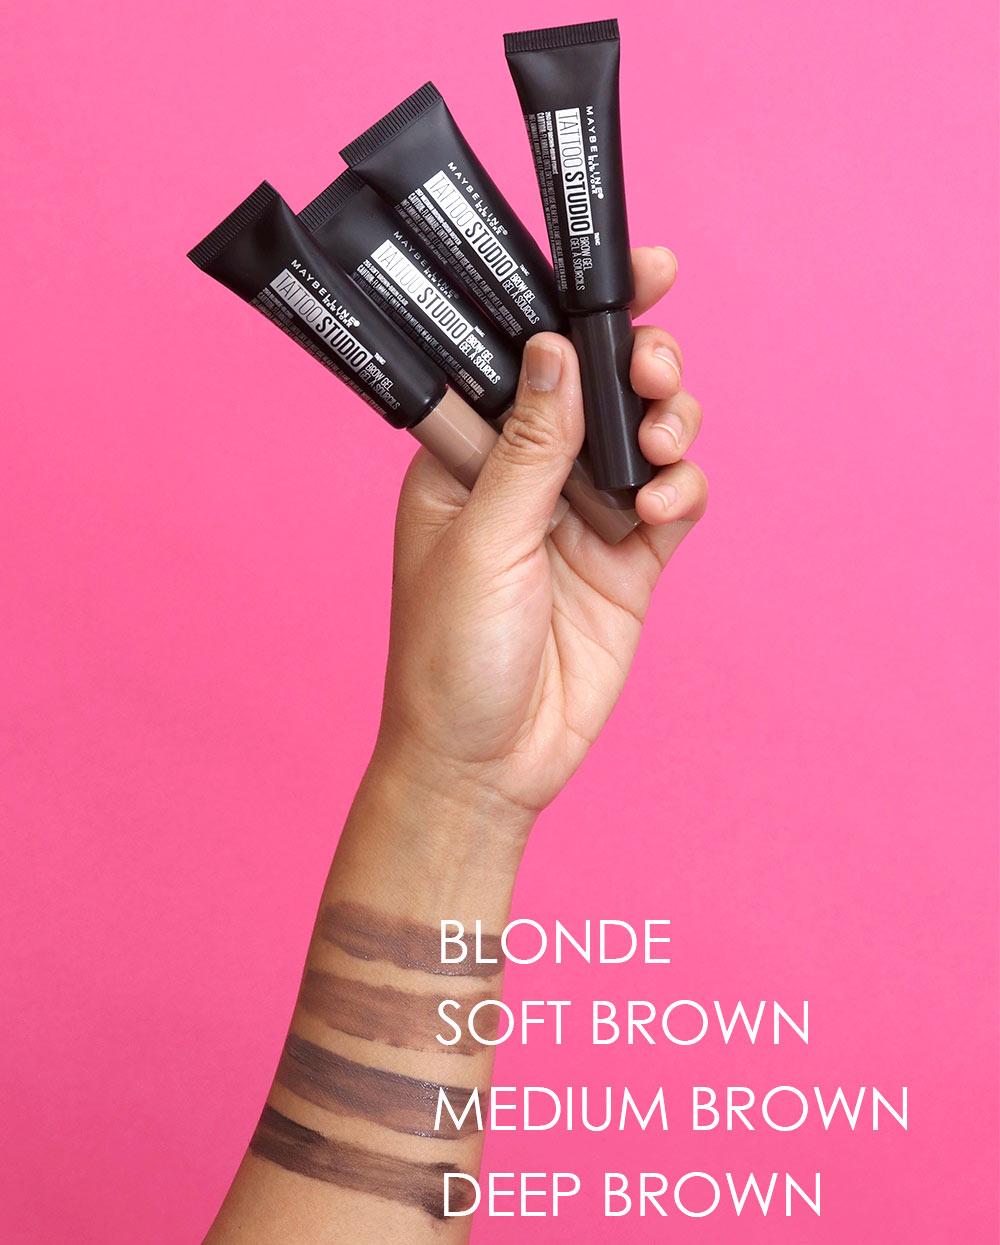 Maybelline Tattoo Studio Waterproof Brow Gel - Makeup and Beauty Blog